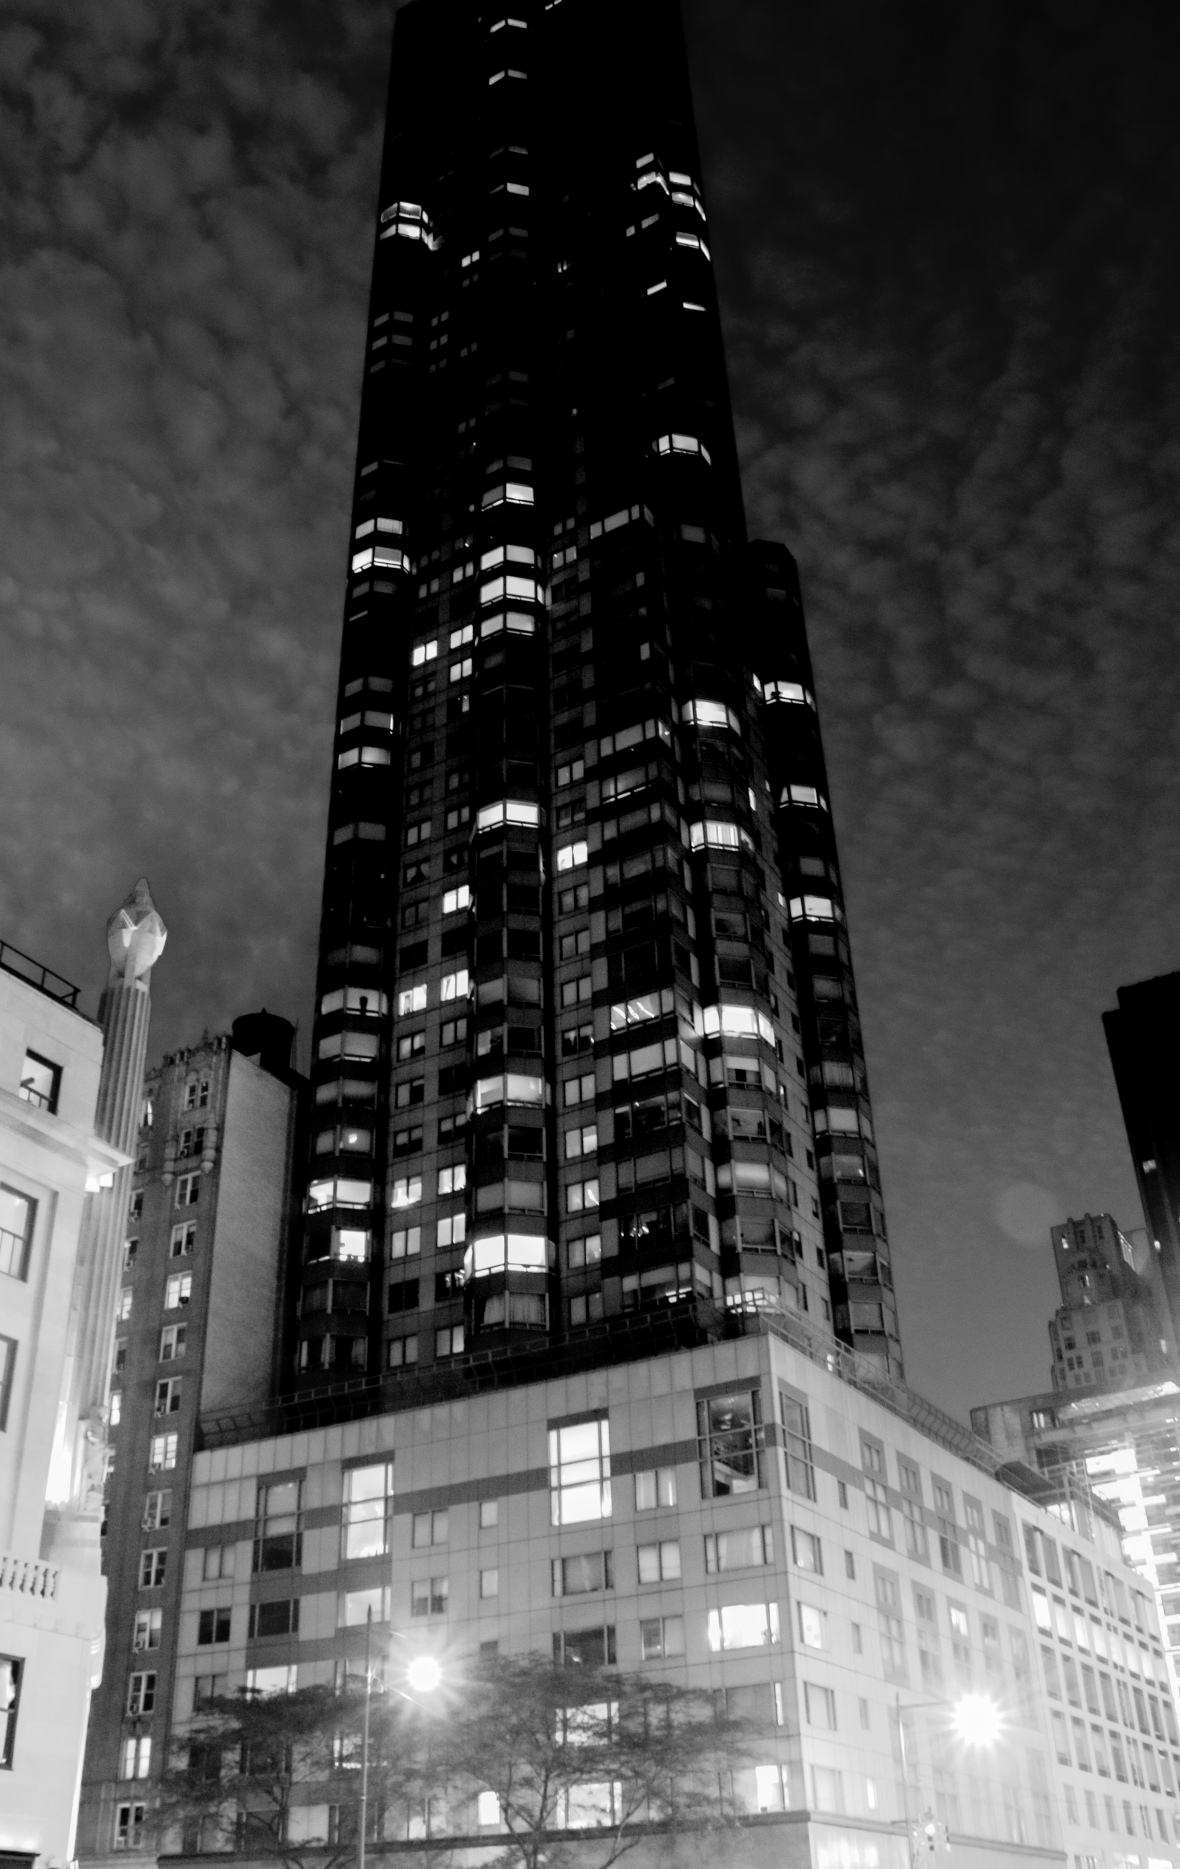 Gotham Nights 5